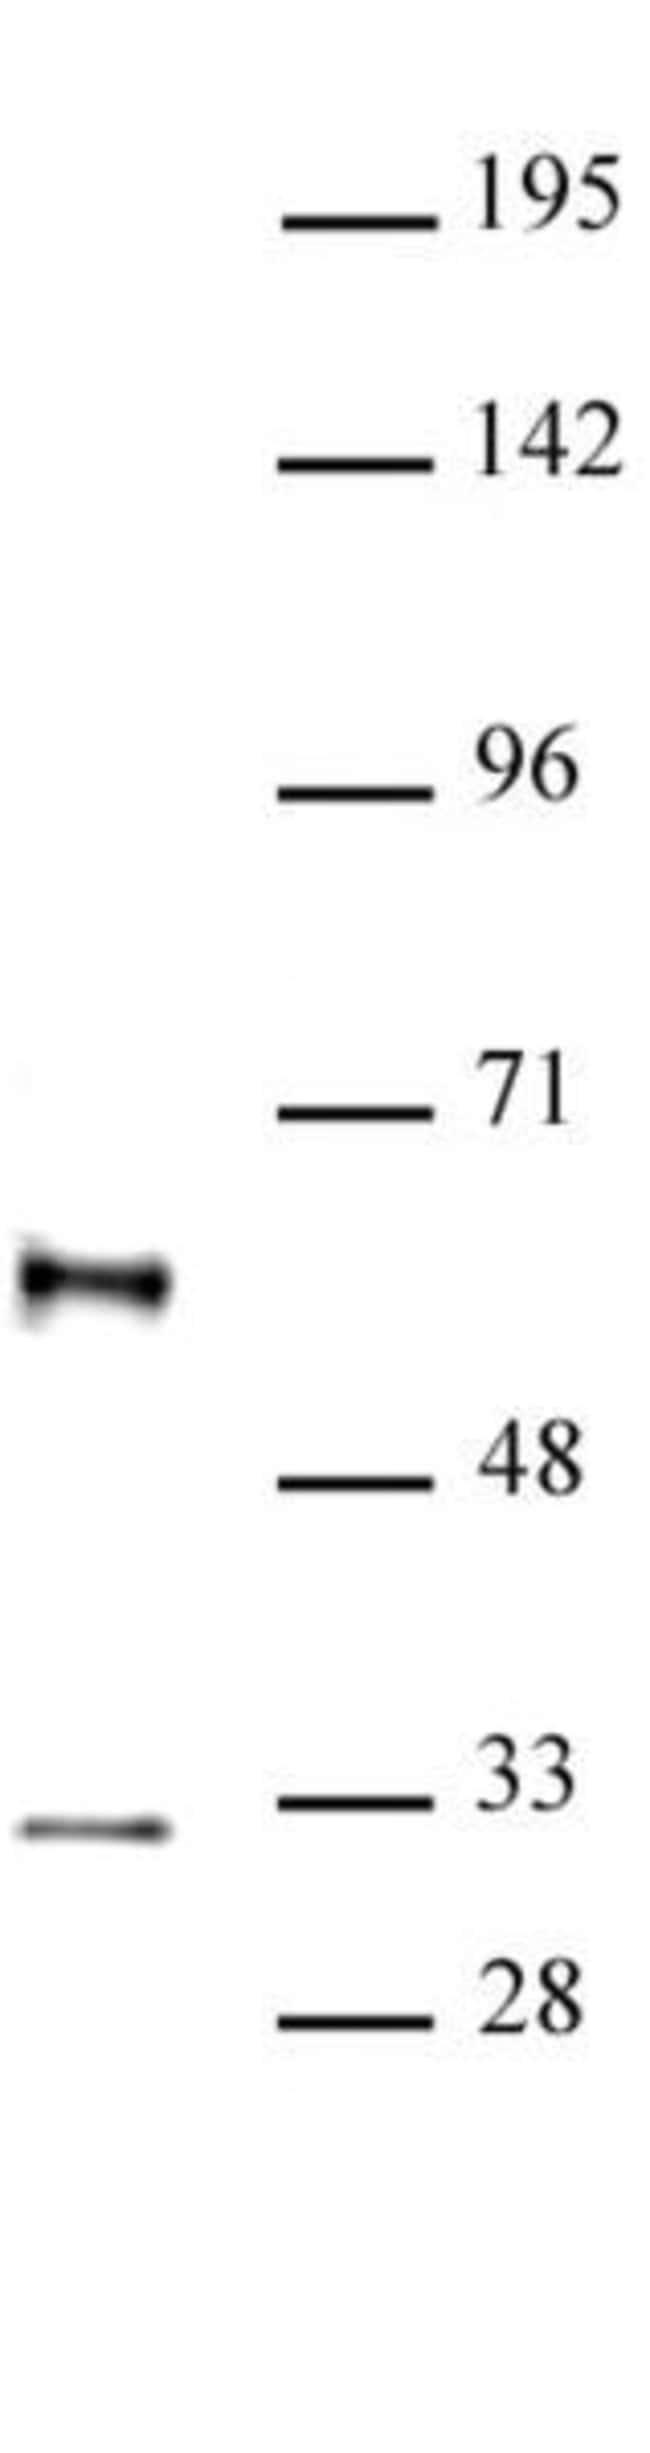 GFI1 Rabbit anti-Human, Unconjugated, Polyclonal, Active Motif:Antibodies:Primary